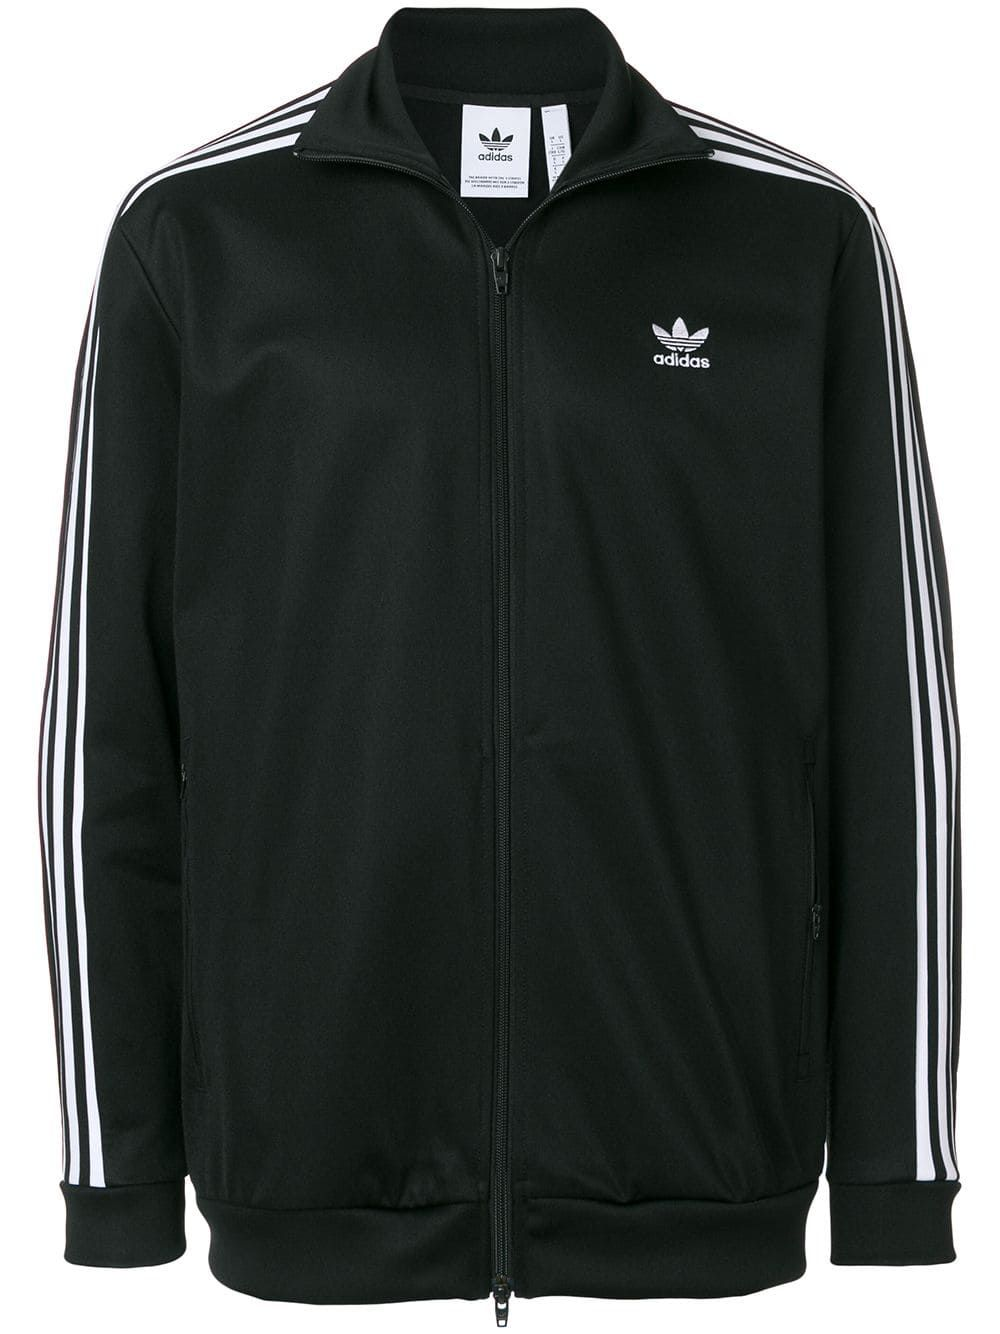 adidas Adidas Originals BB track jacket Black in 2019